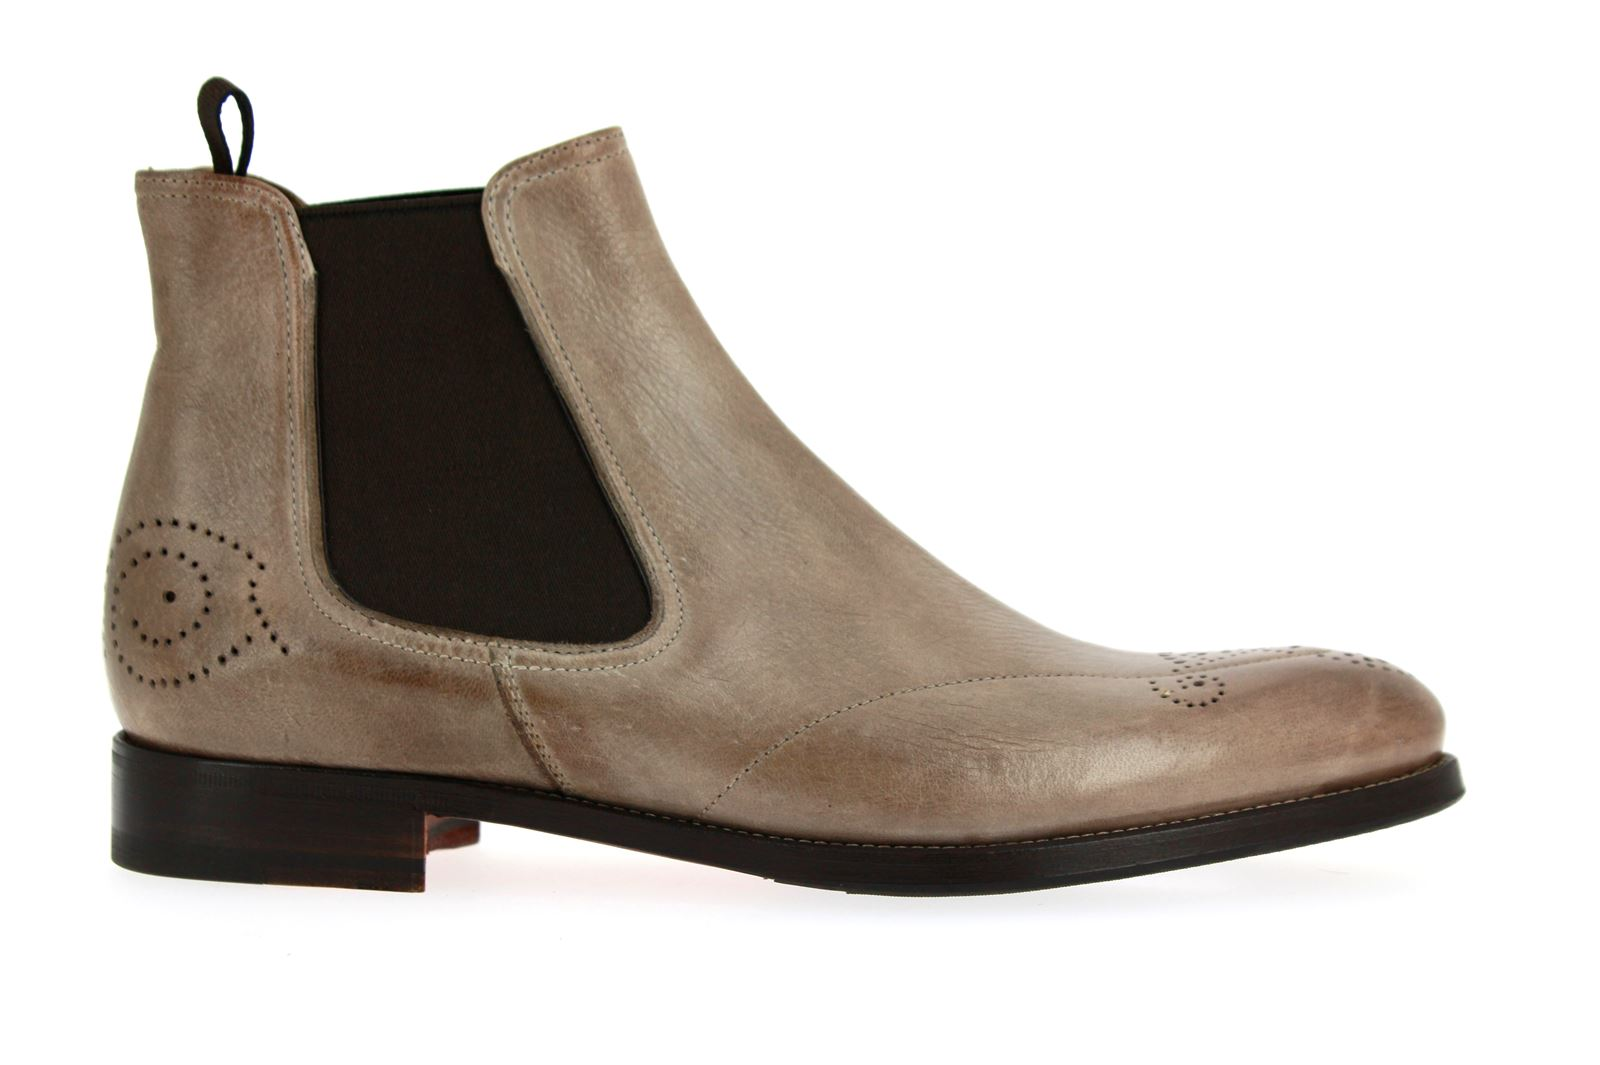 Benson's Chelsea Boot ANGELA TORTORA